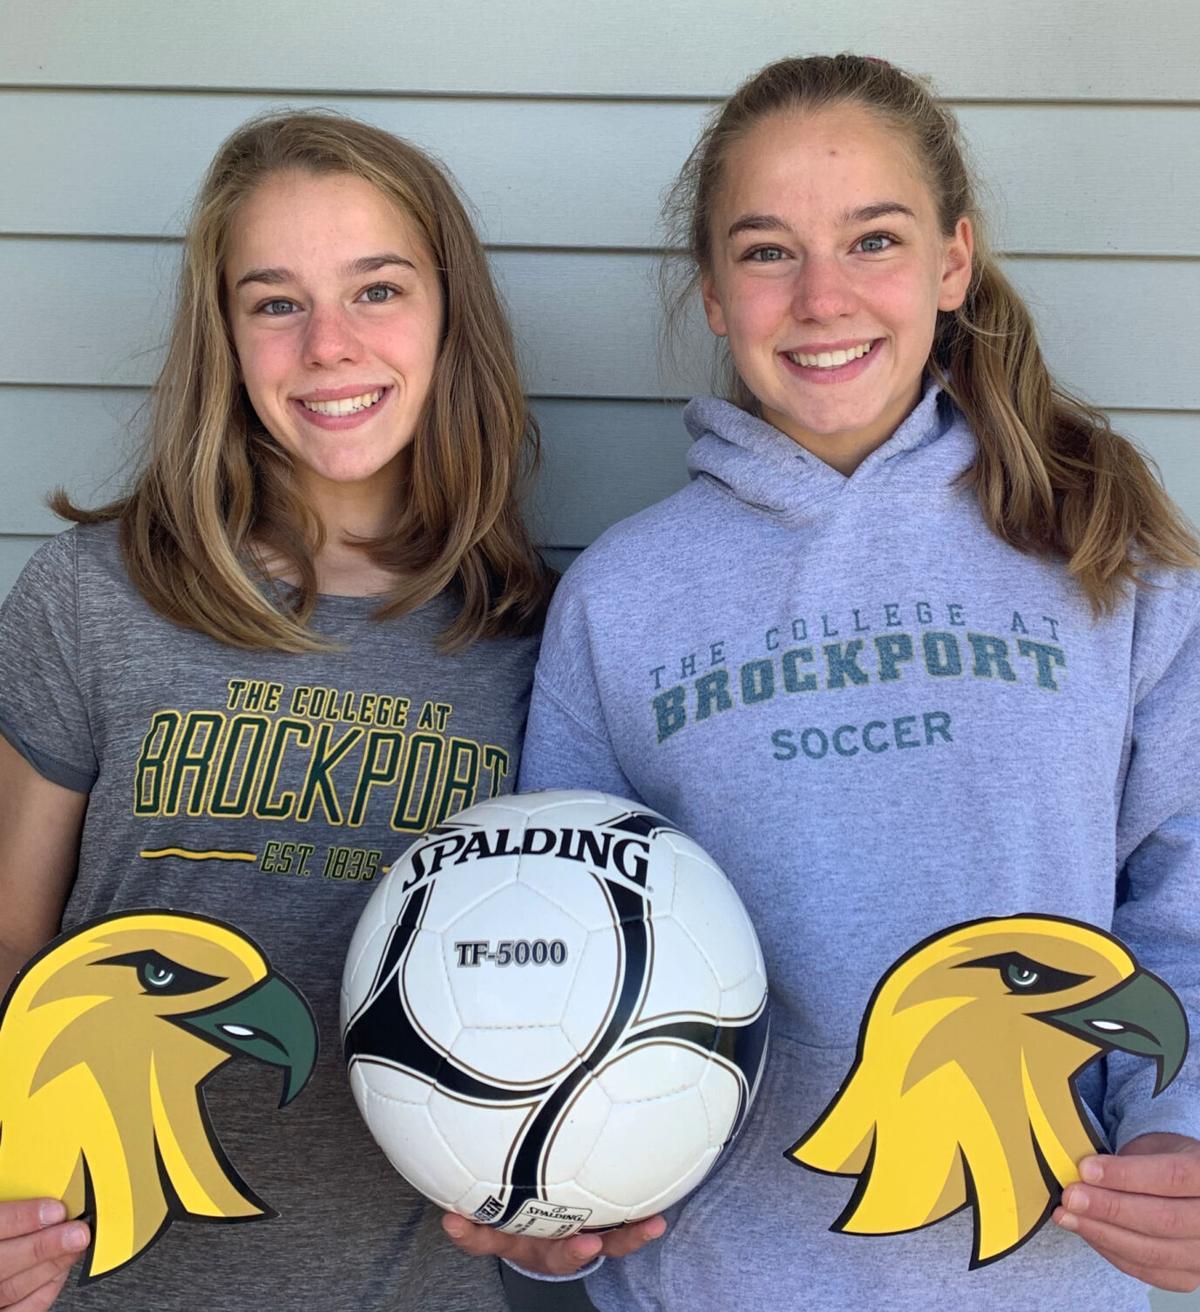 Isereau twins ready to share soccer field again